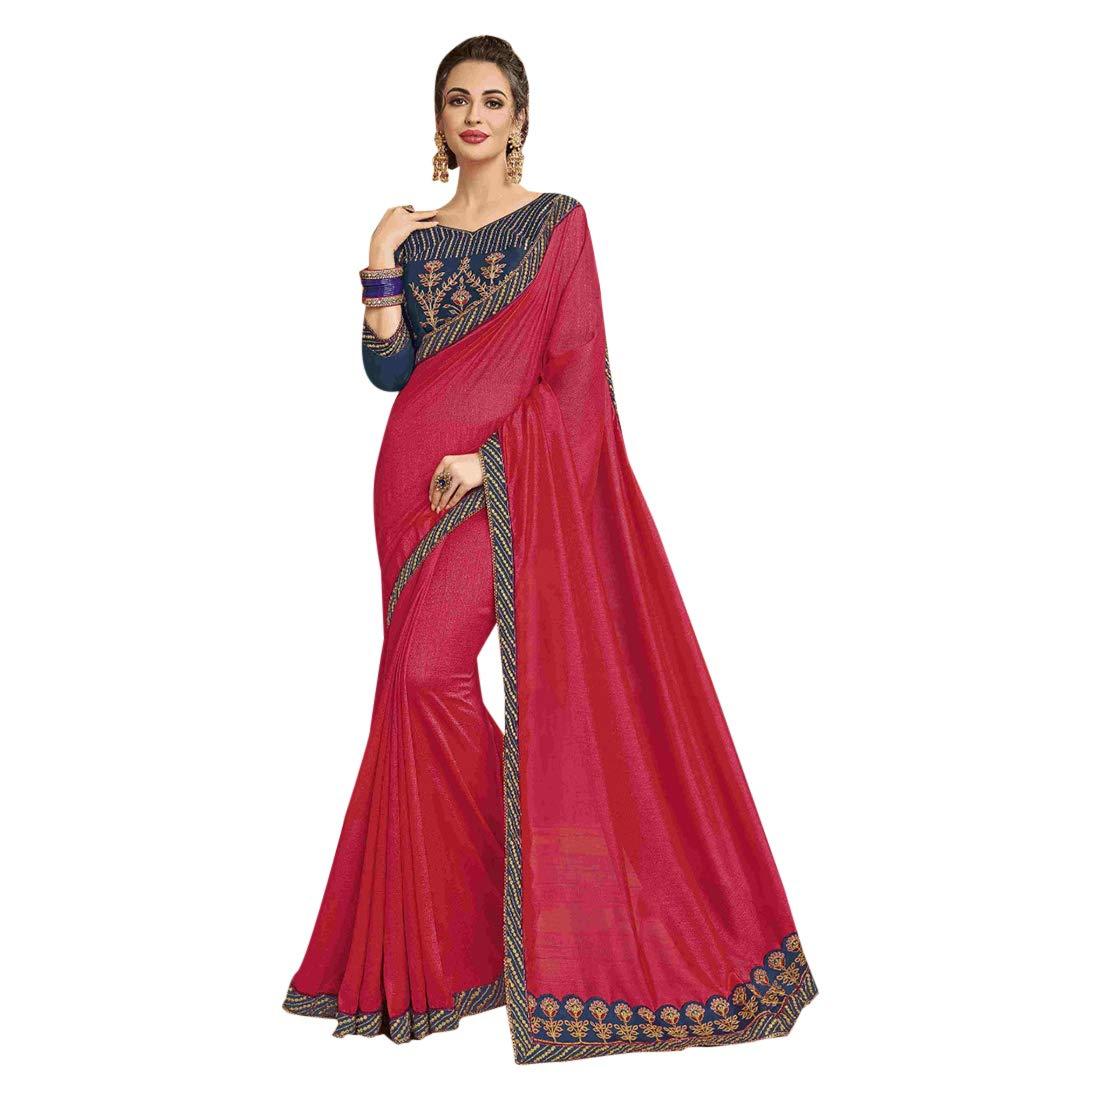 Crimson Hit Ethnic Designer Fancy Silk Sari with Blouse piece Indian Saree for Women Party wear 7761